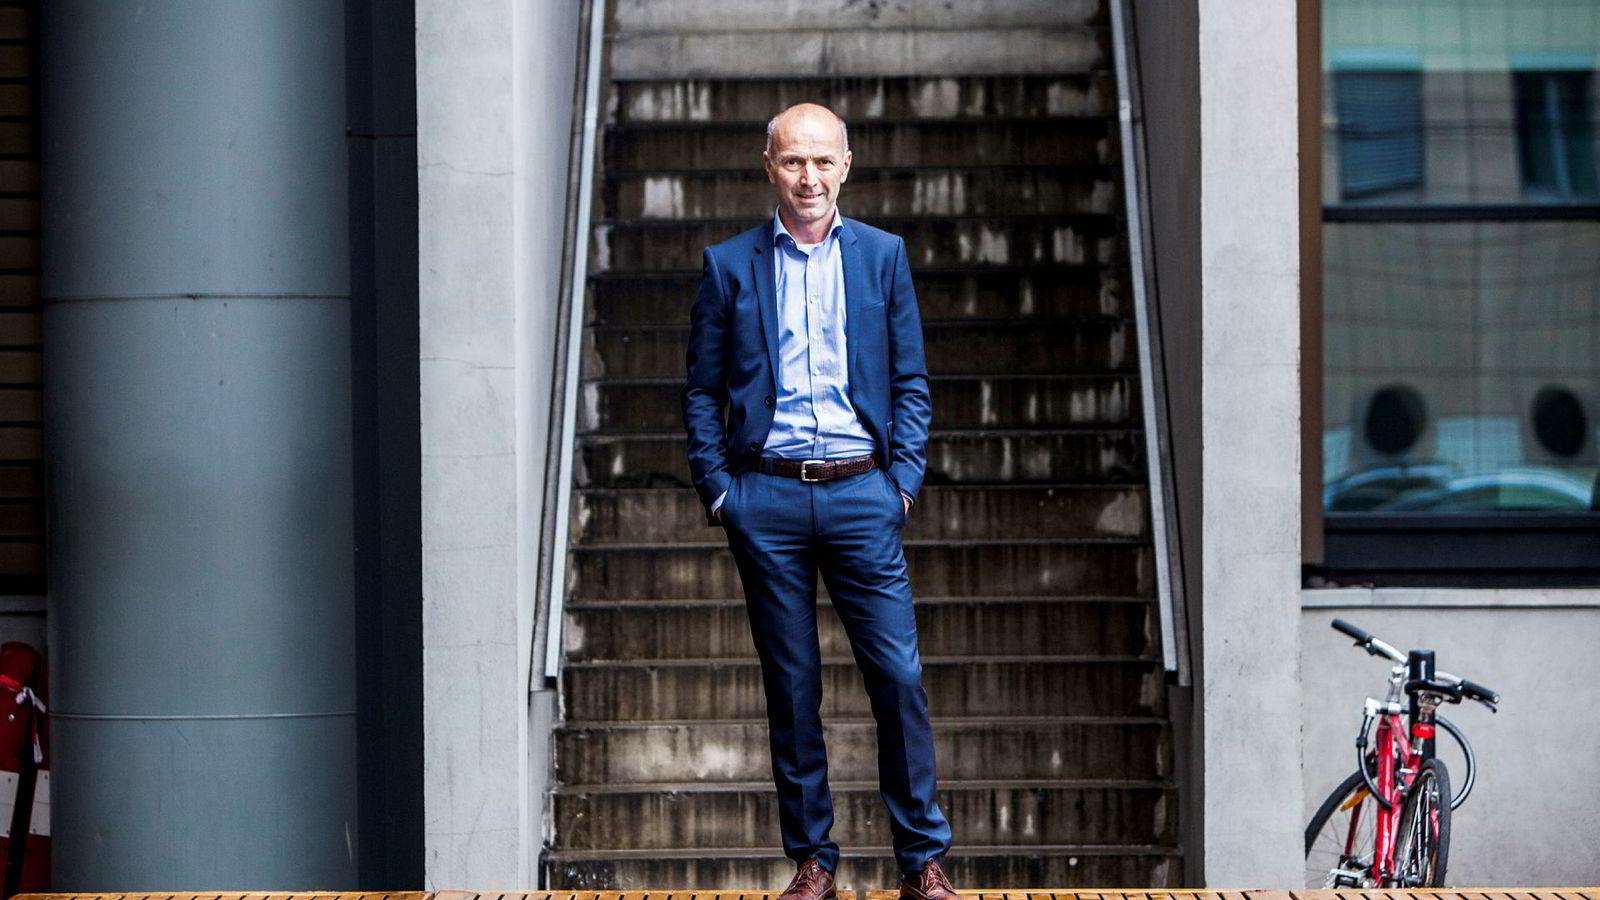 Styr privatøkonomien din selv, er den klare anbefalingen fra banksjef Gunnar Hovland i BN Bank.